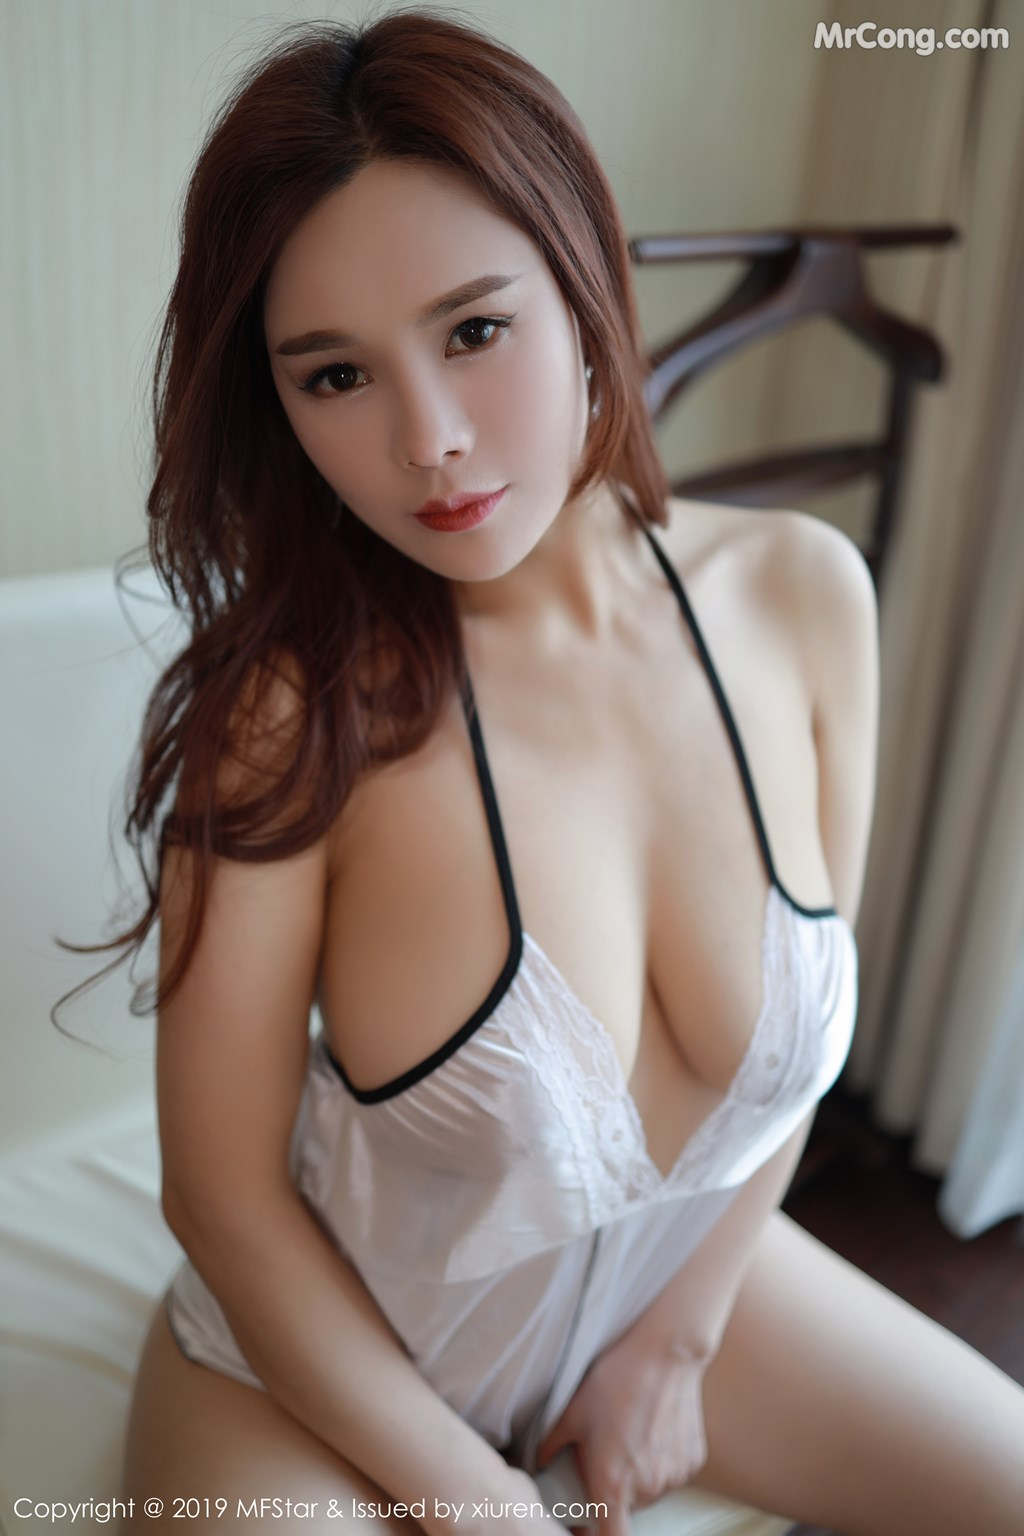 Image MFStar-Vol.185-201712-MrCong.com-005 in post MFStar Vol.185: 胡润曦201712 (41 ảnh)